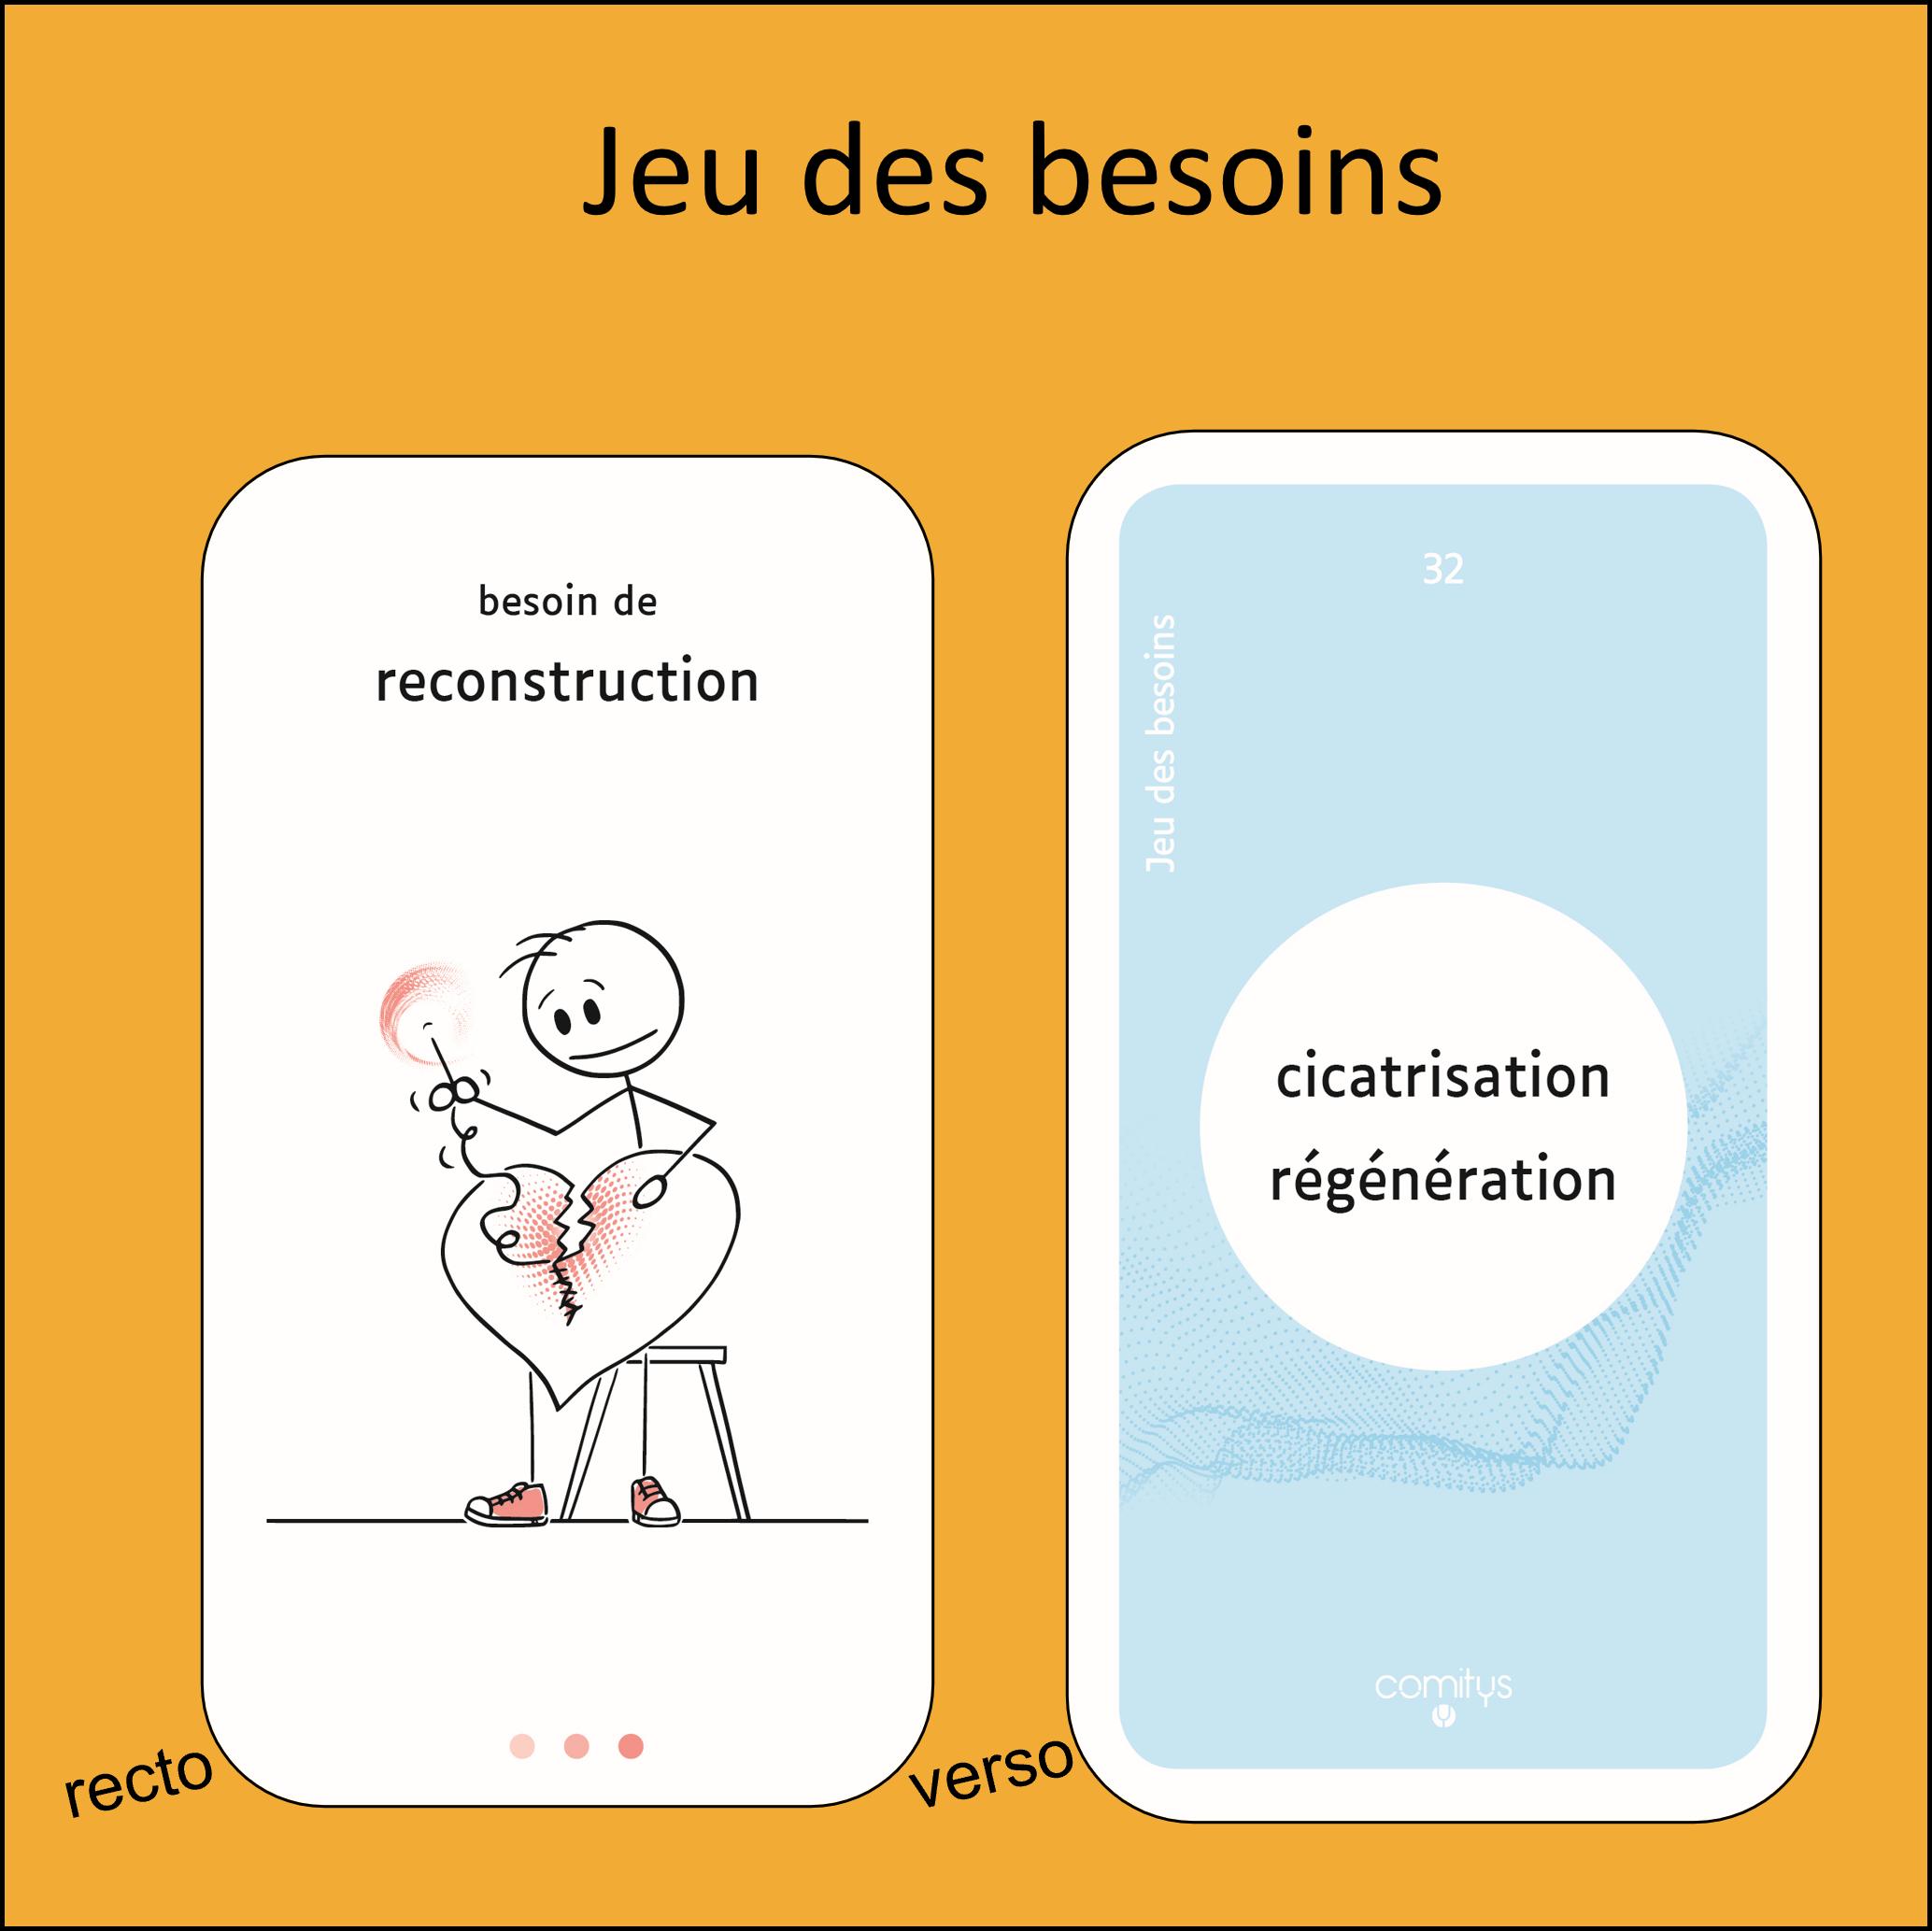 jeu-des-besoins-comitys-recto-verso